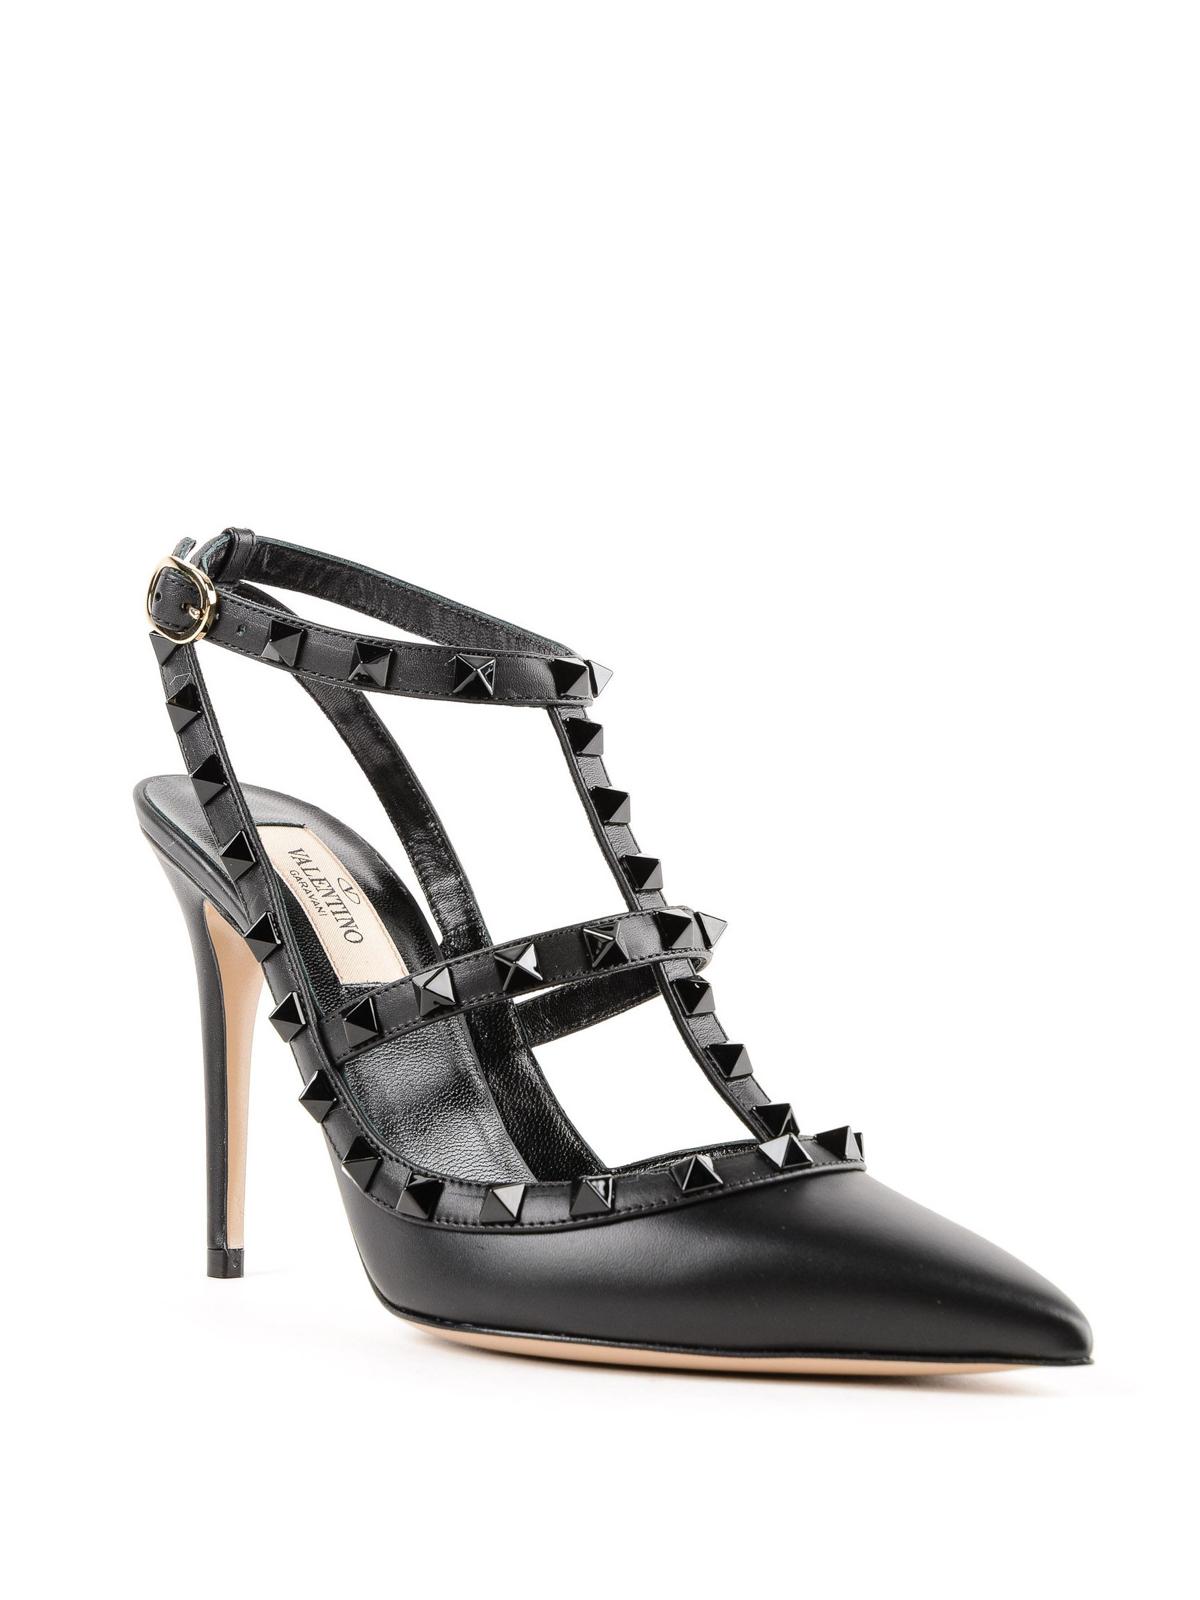 41706ba7e24 VALENTINO GARAVANI  court shoes online - Rockstud total black leather  slingbacks